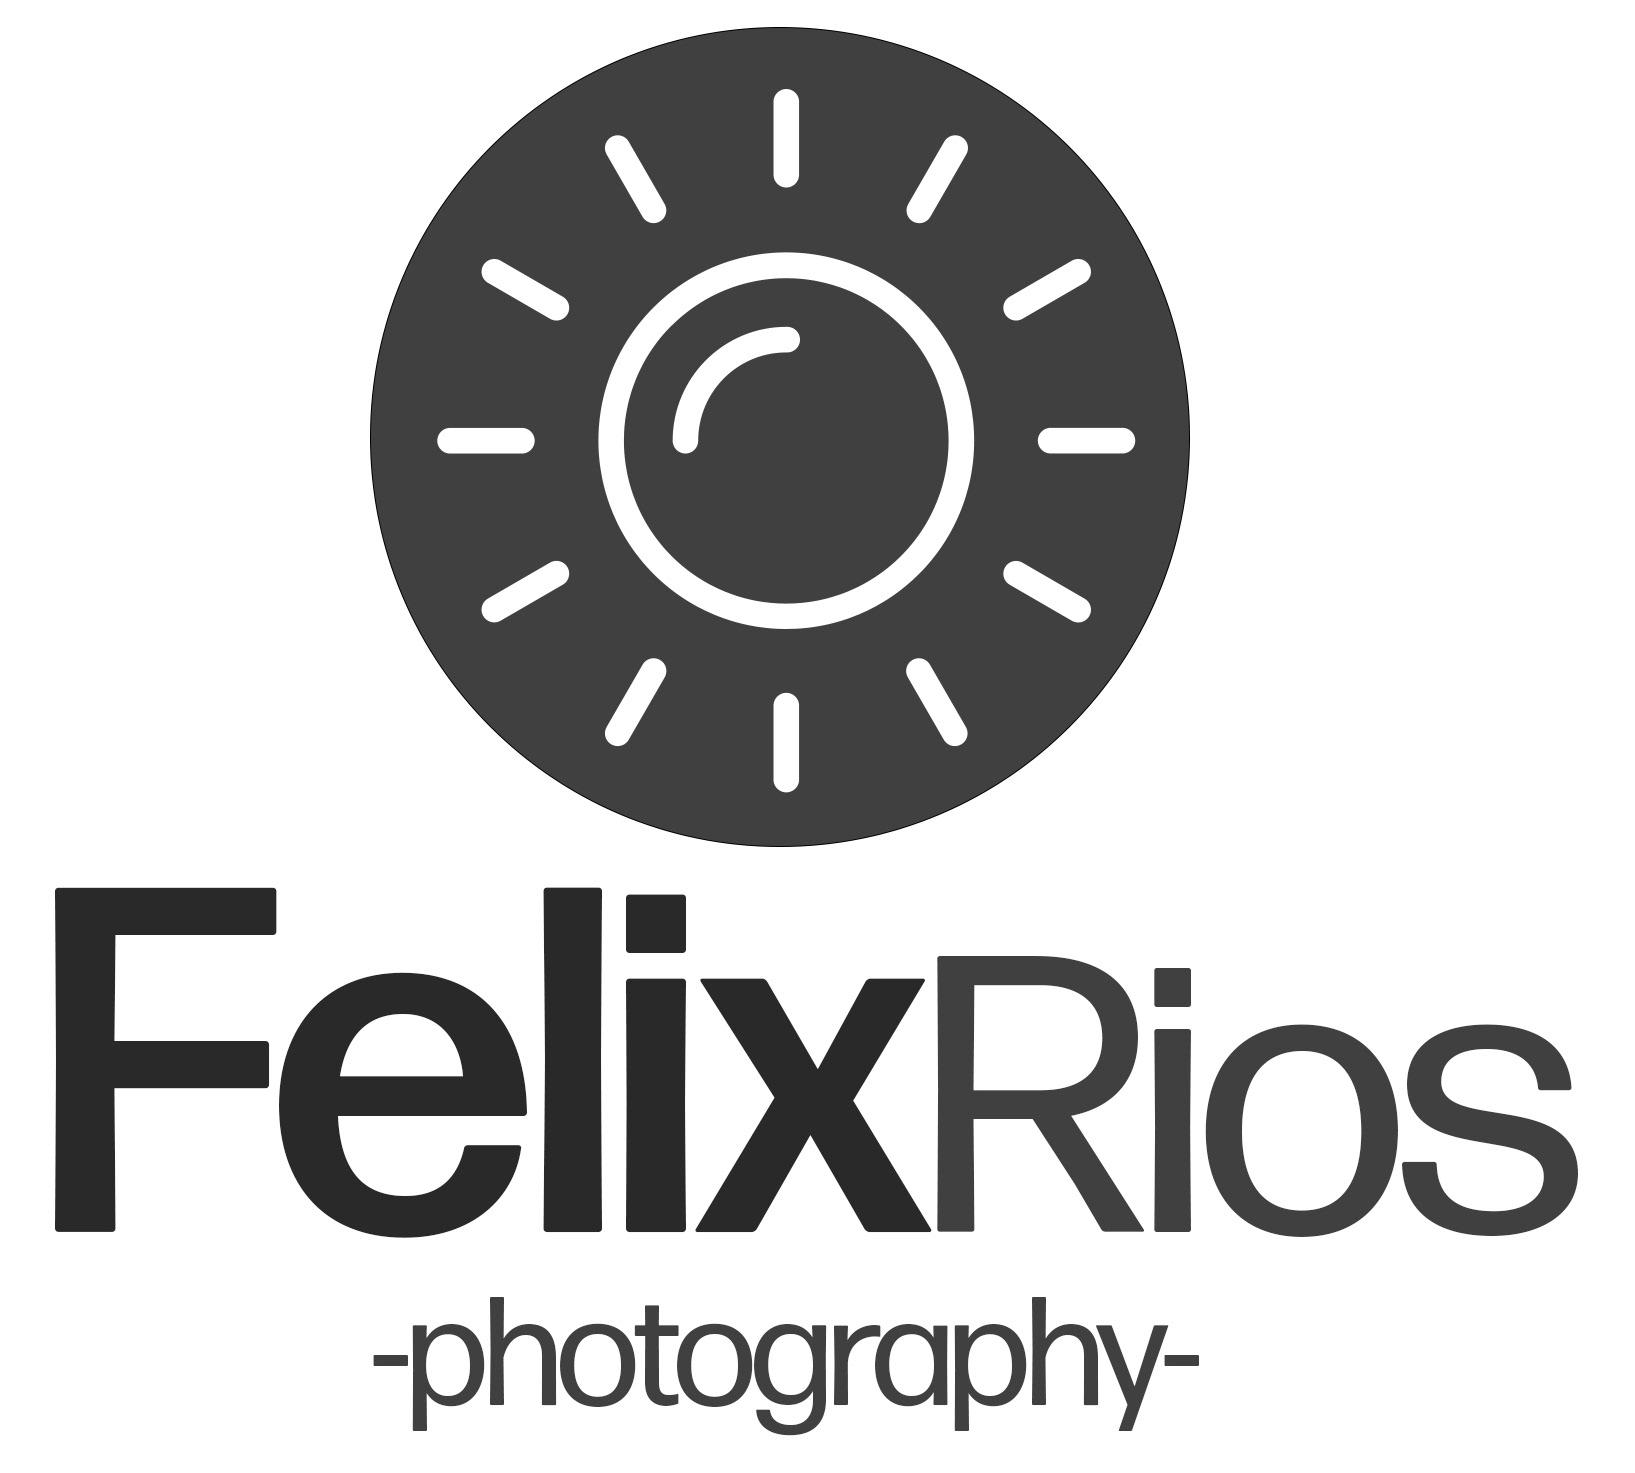 Felix Rios